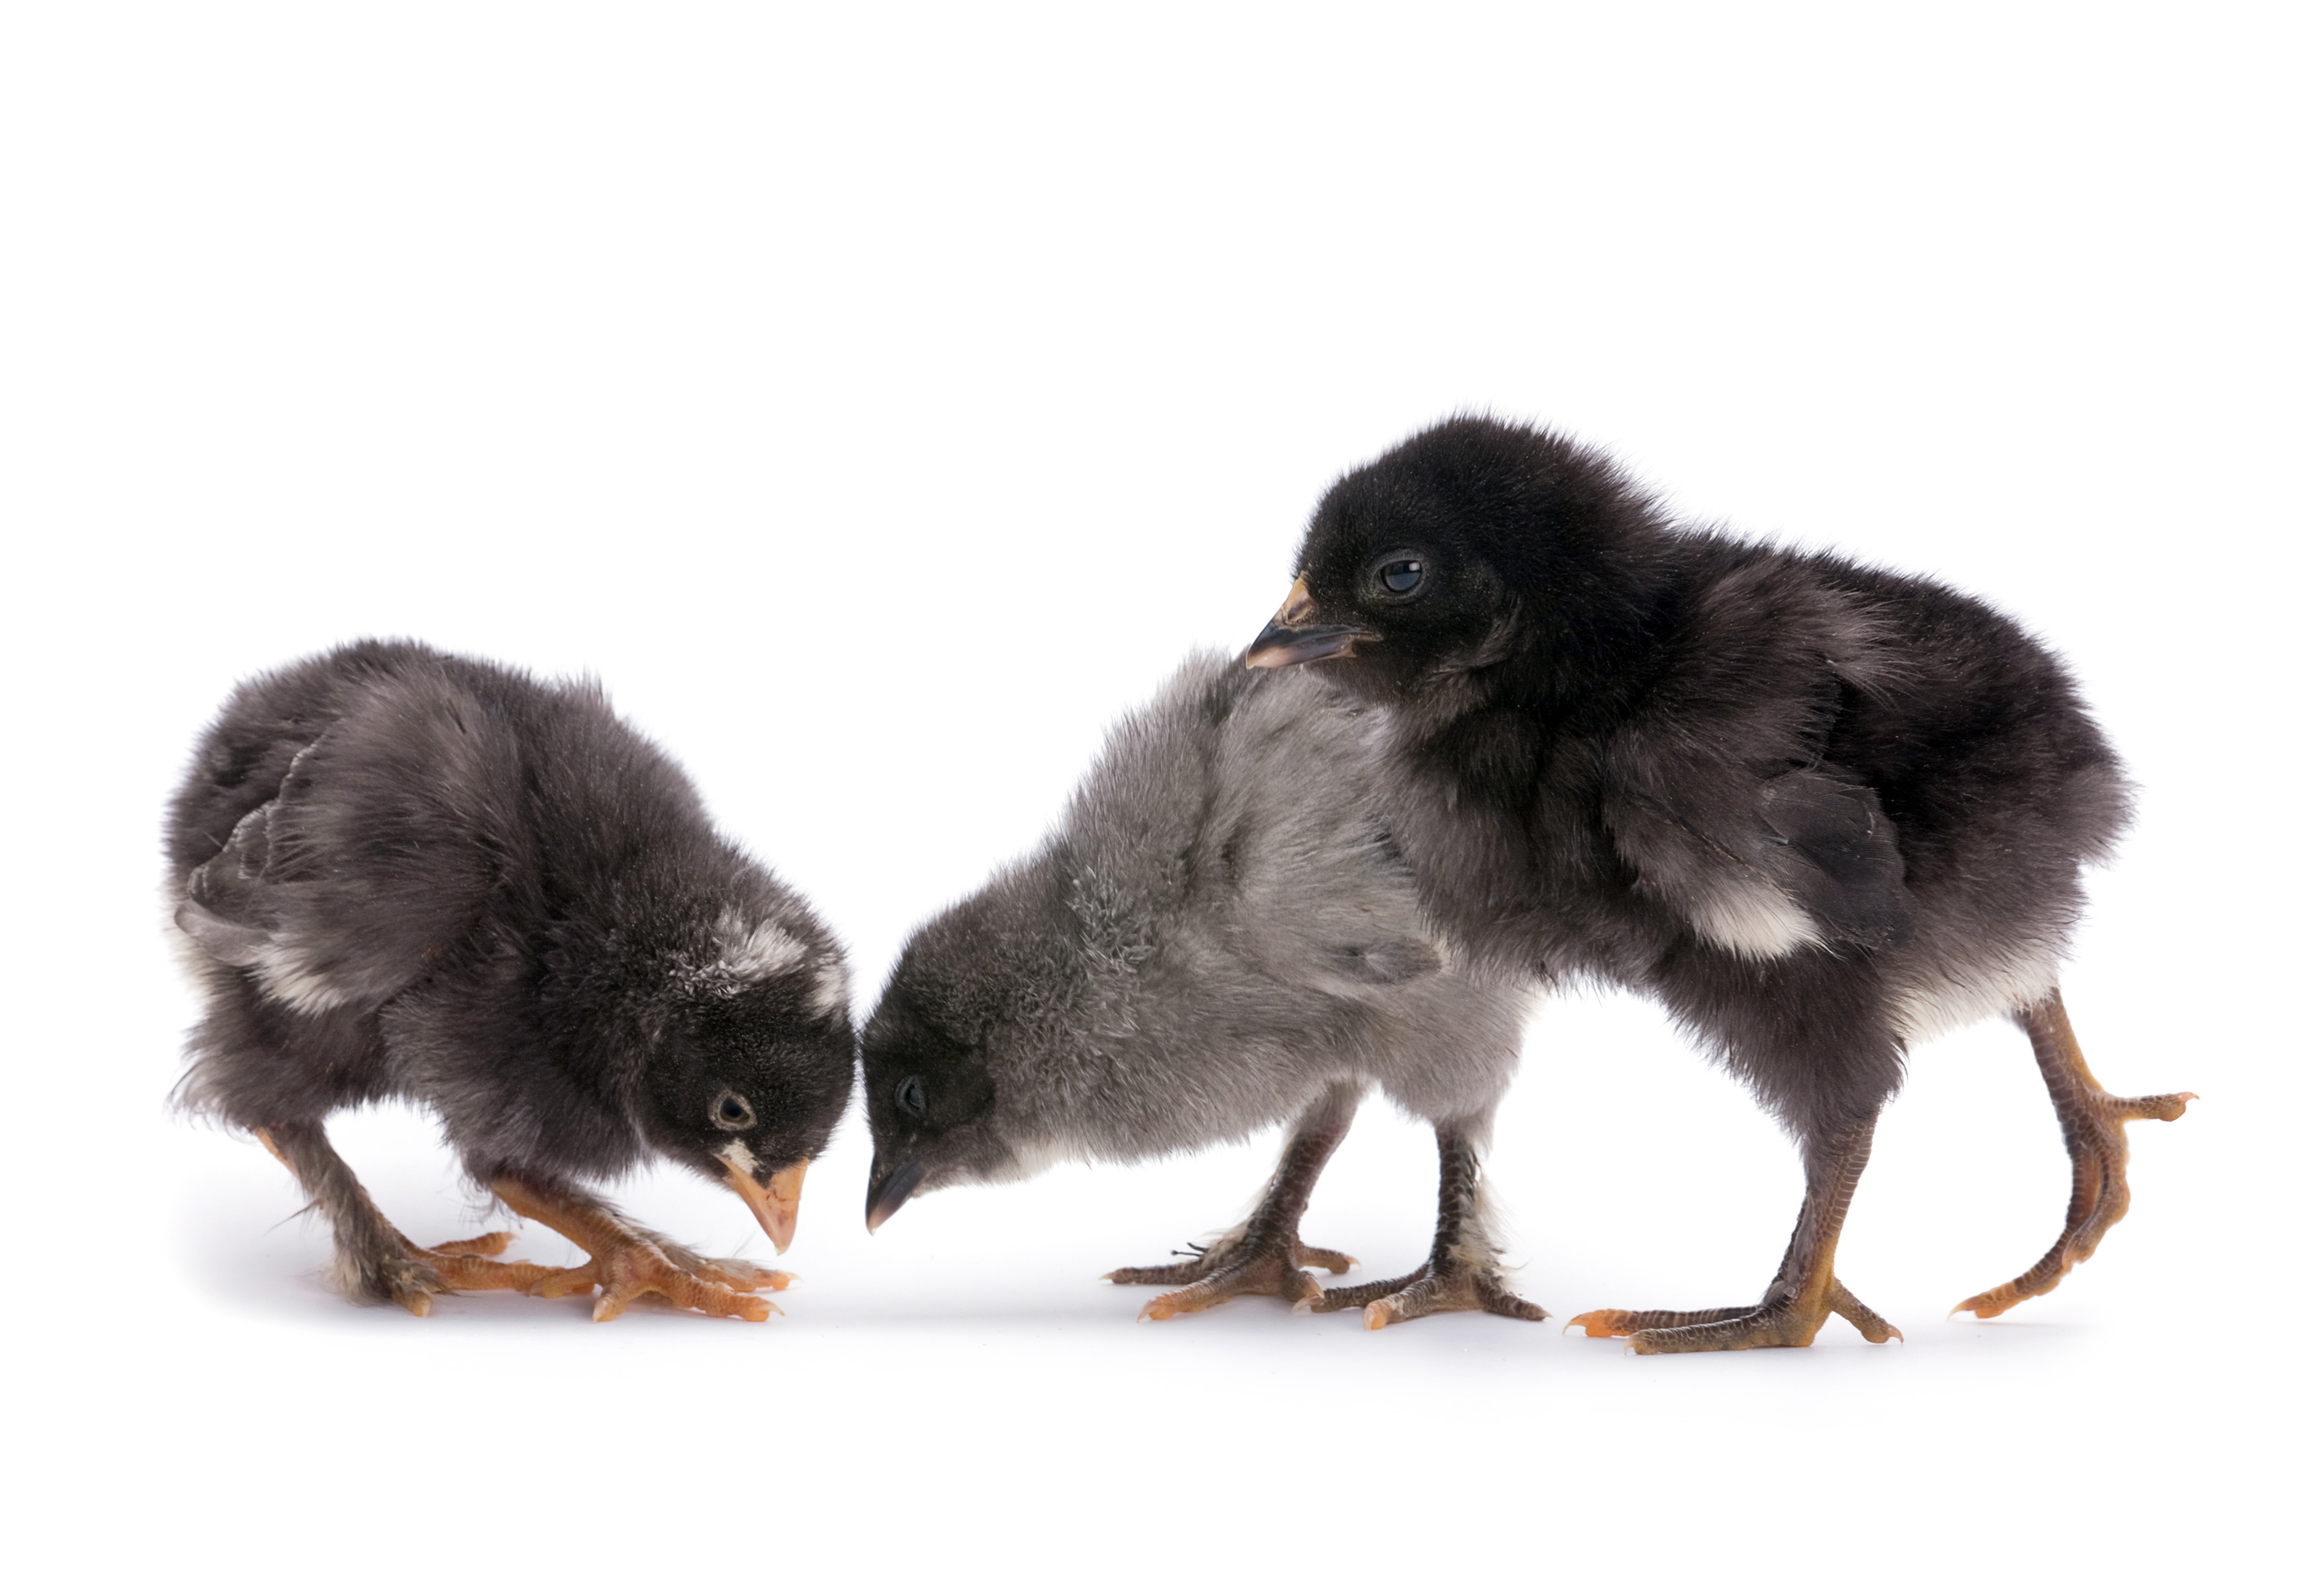 gray baby birds